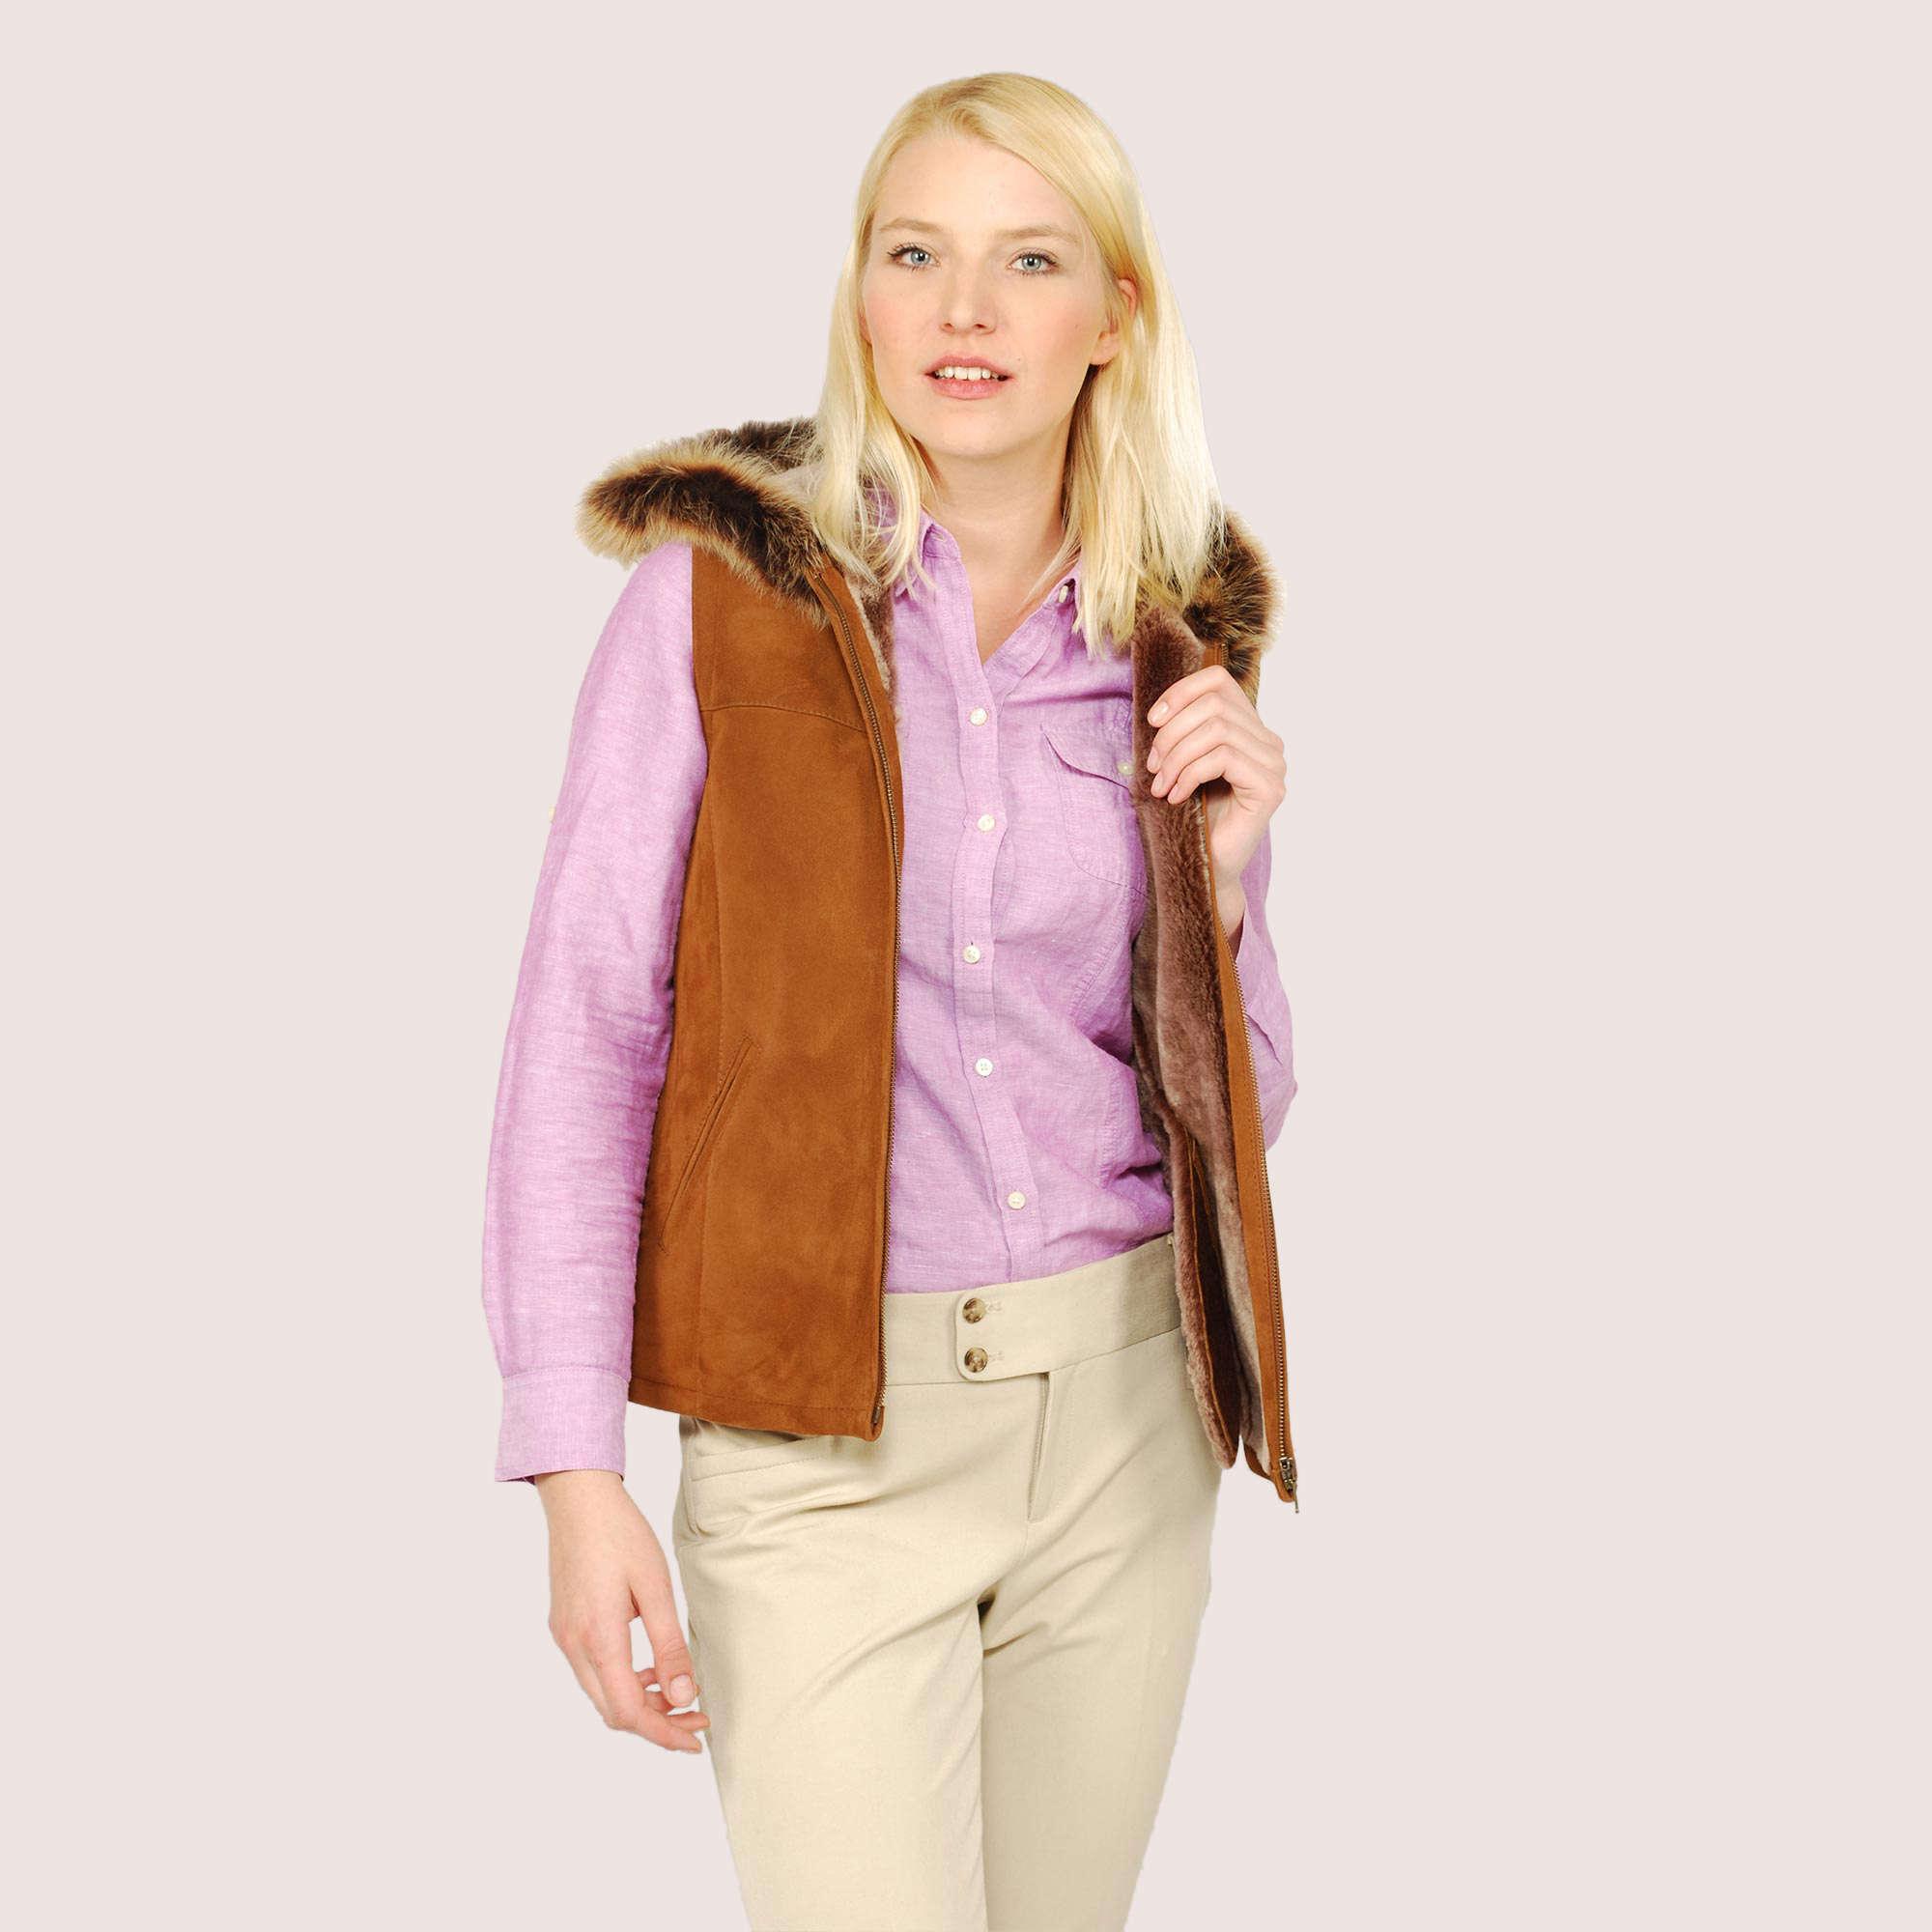 Celine Shearling Vest